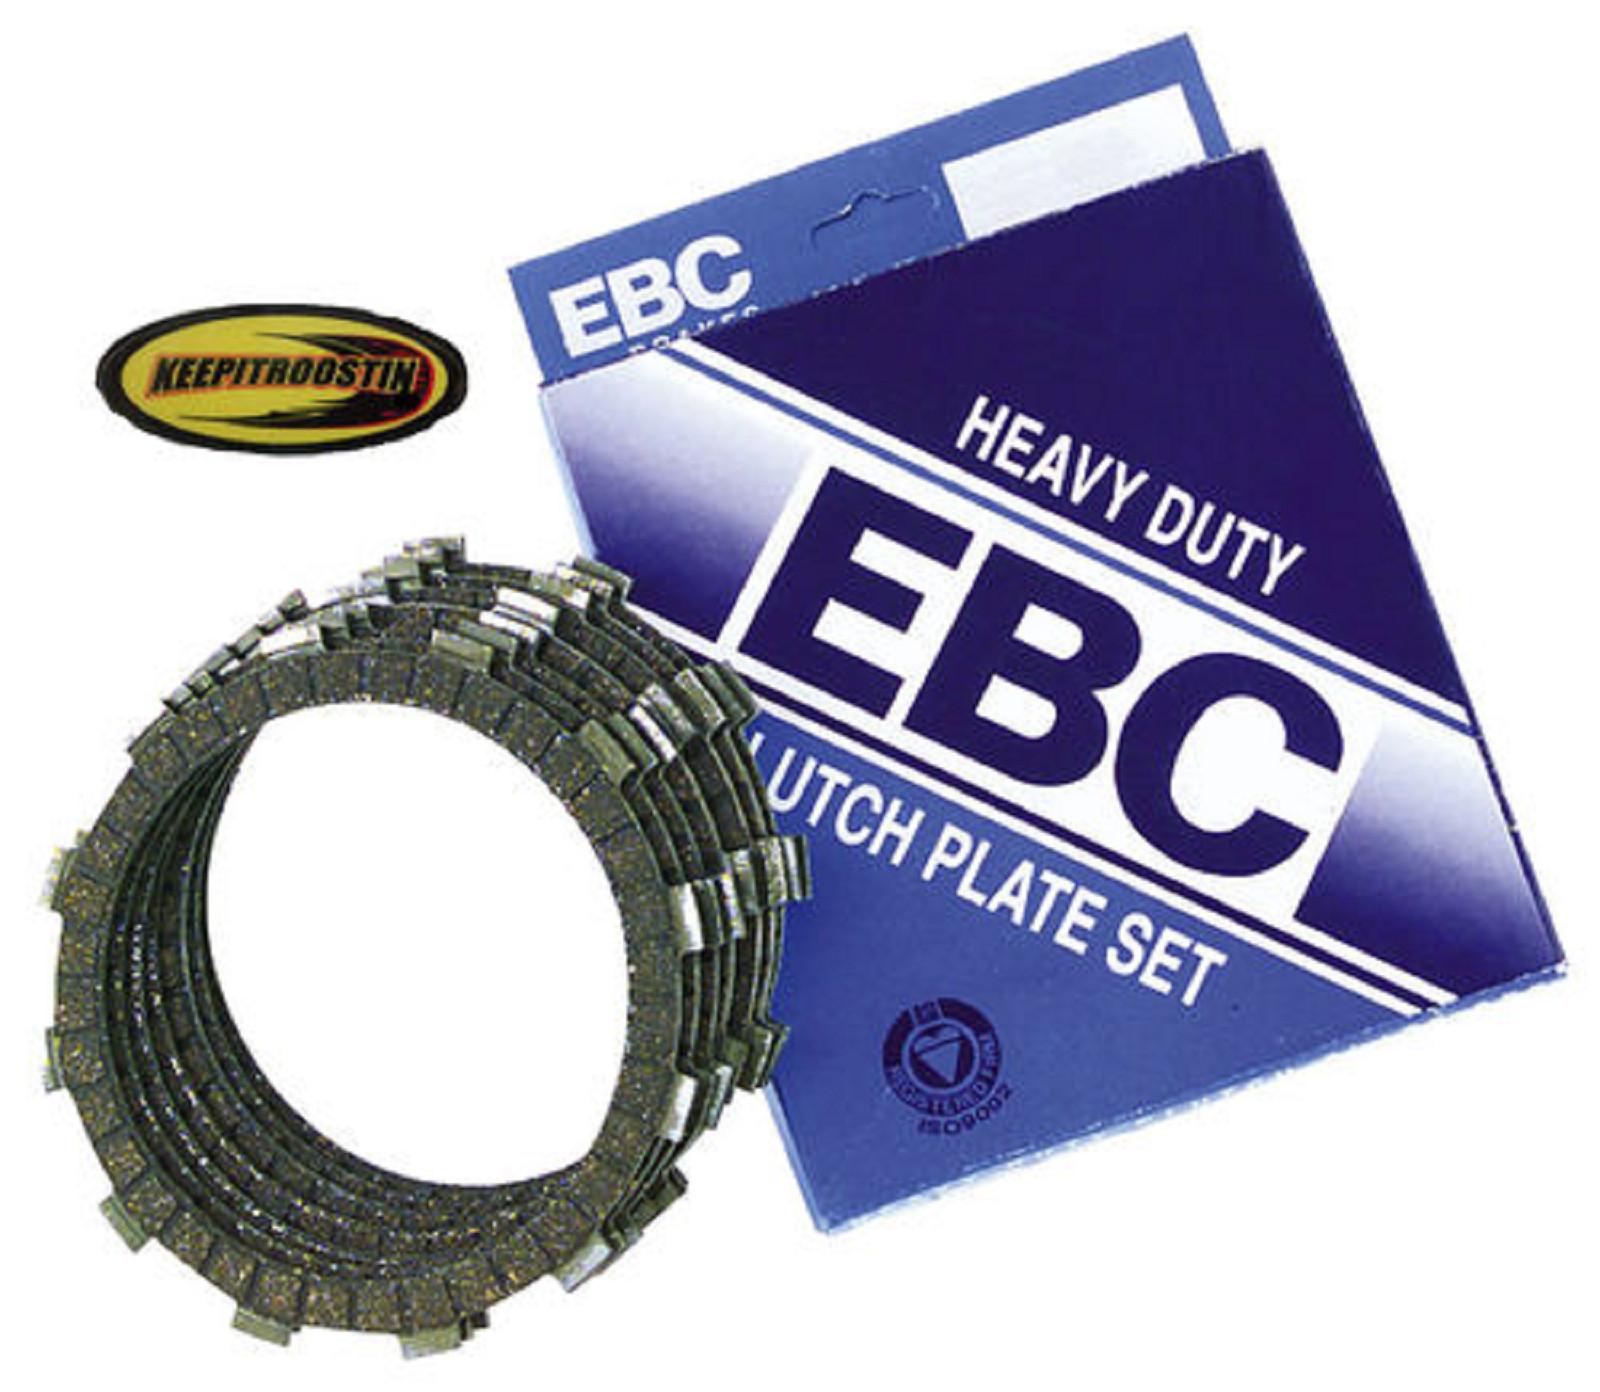 Clutch Plates Ebc for Honda Cr 125 1986-1999 Cr125 125r